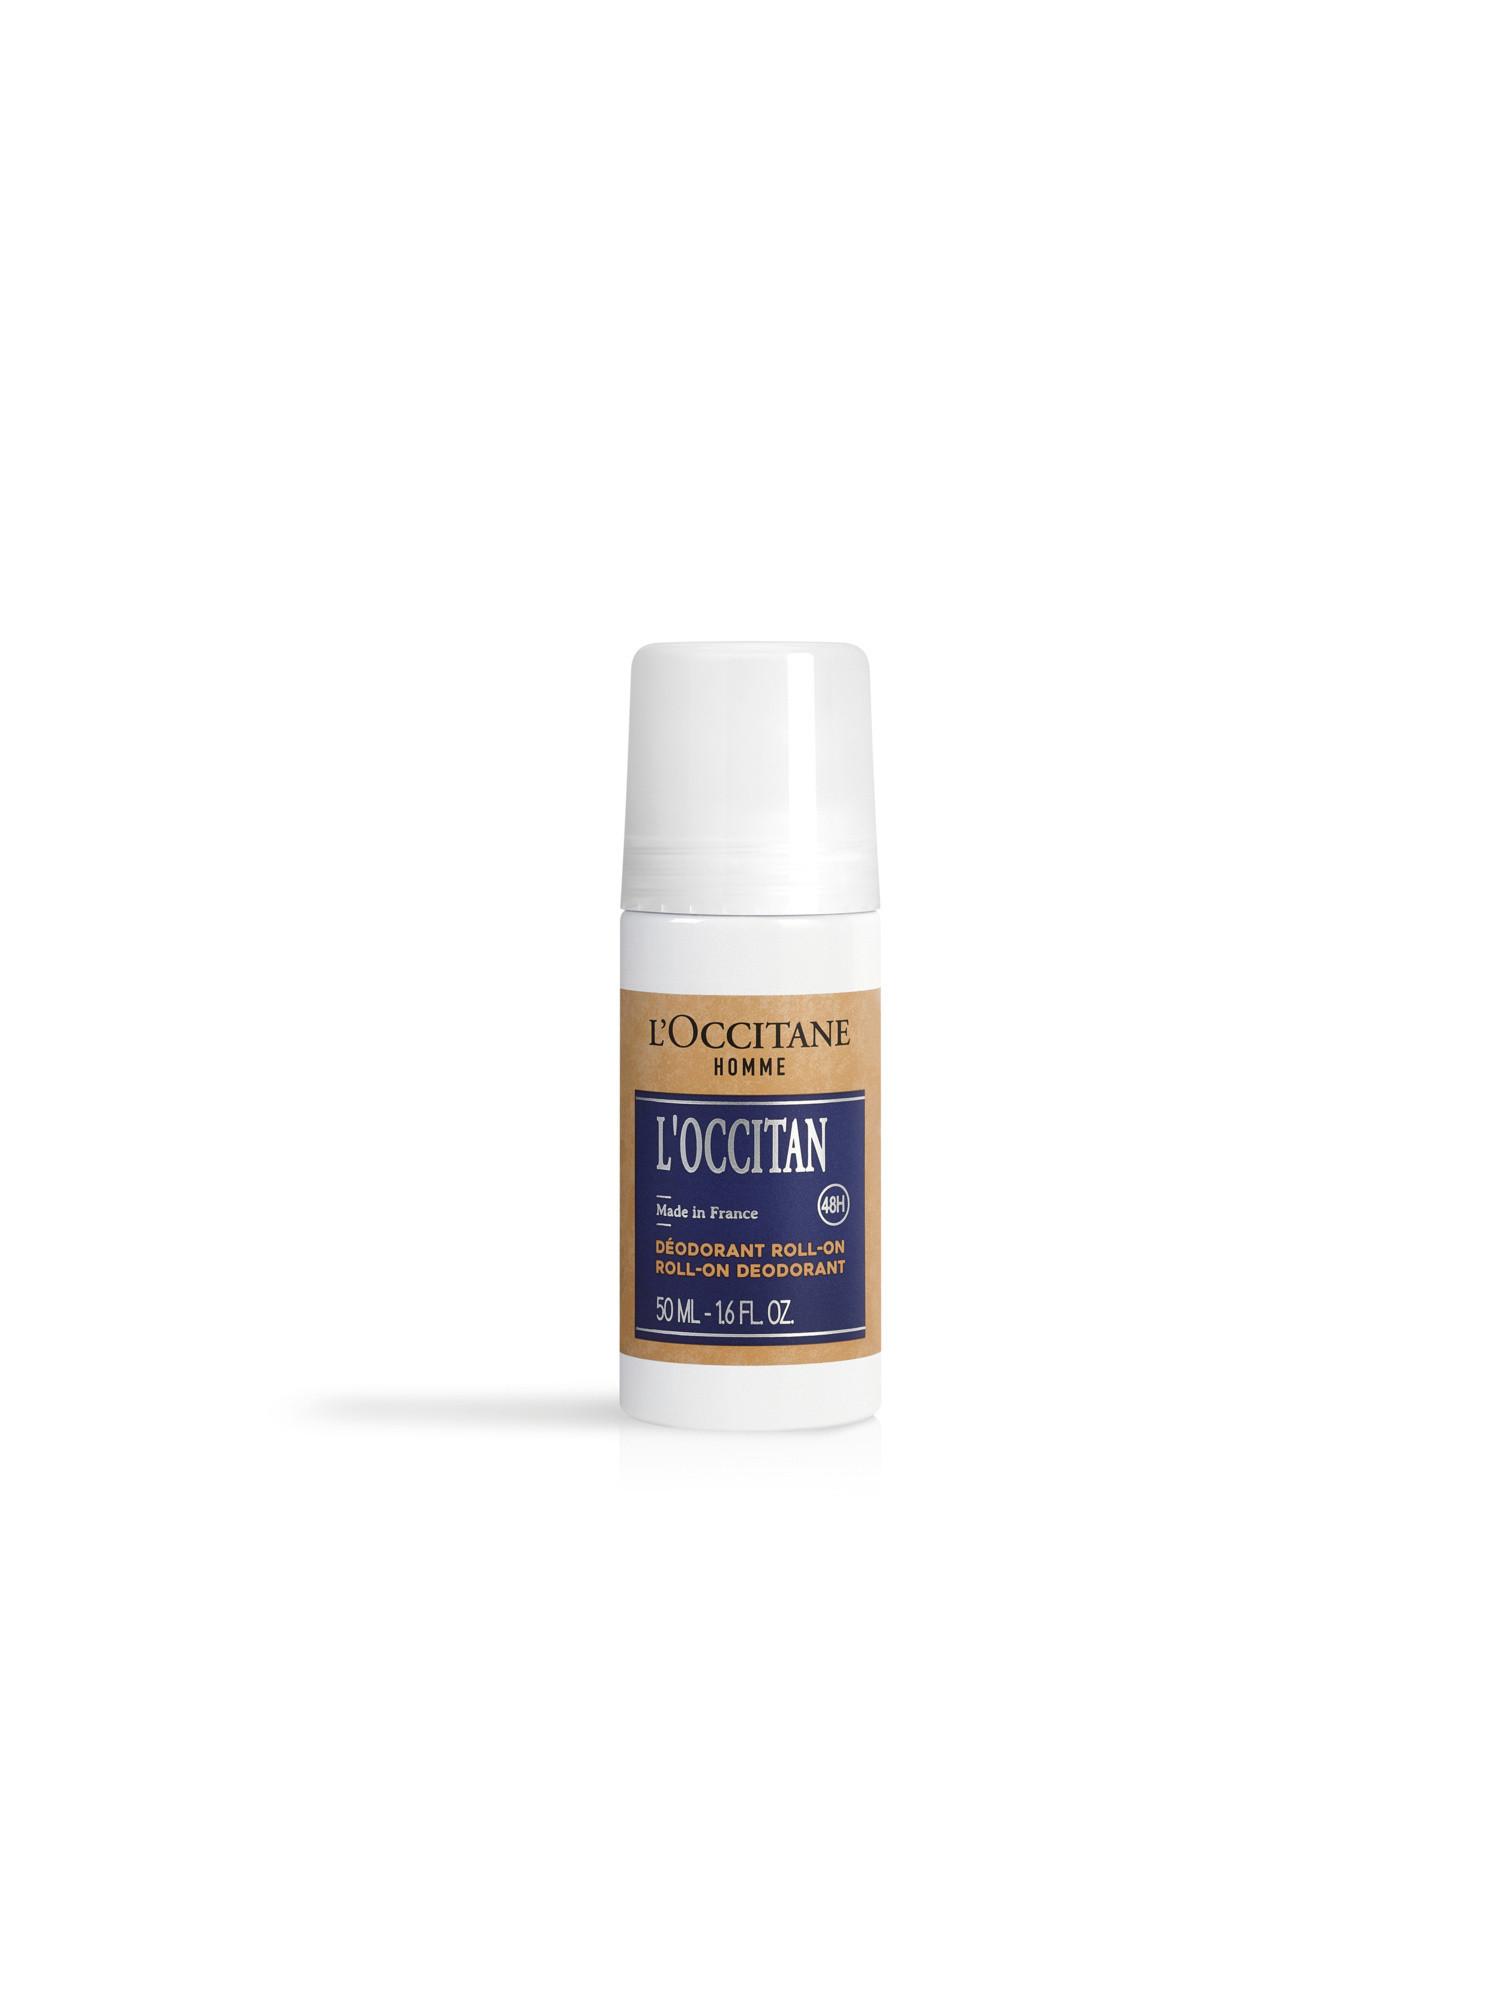 Deodorante Roll-On L'Occitan 50 ml, Trasparente, large image number 0